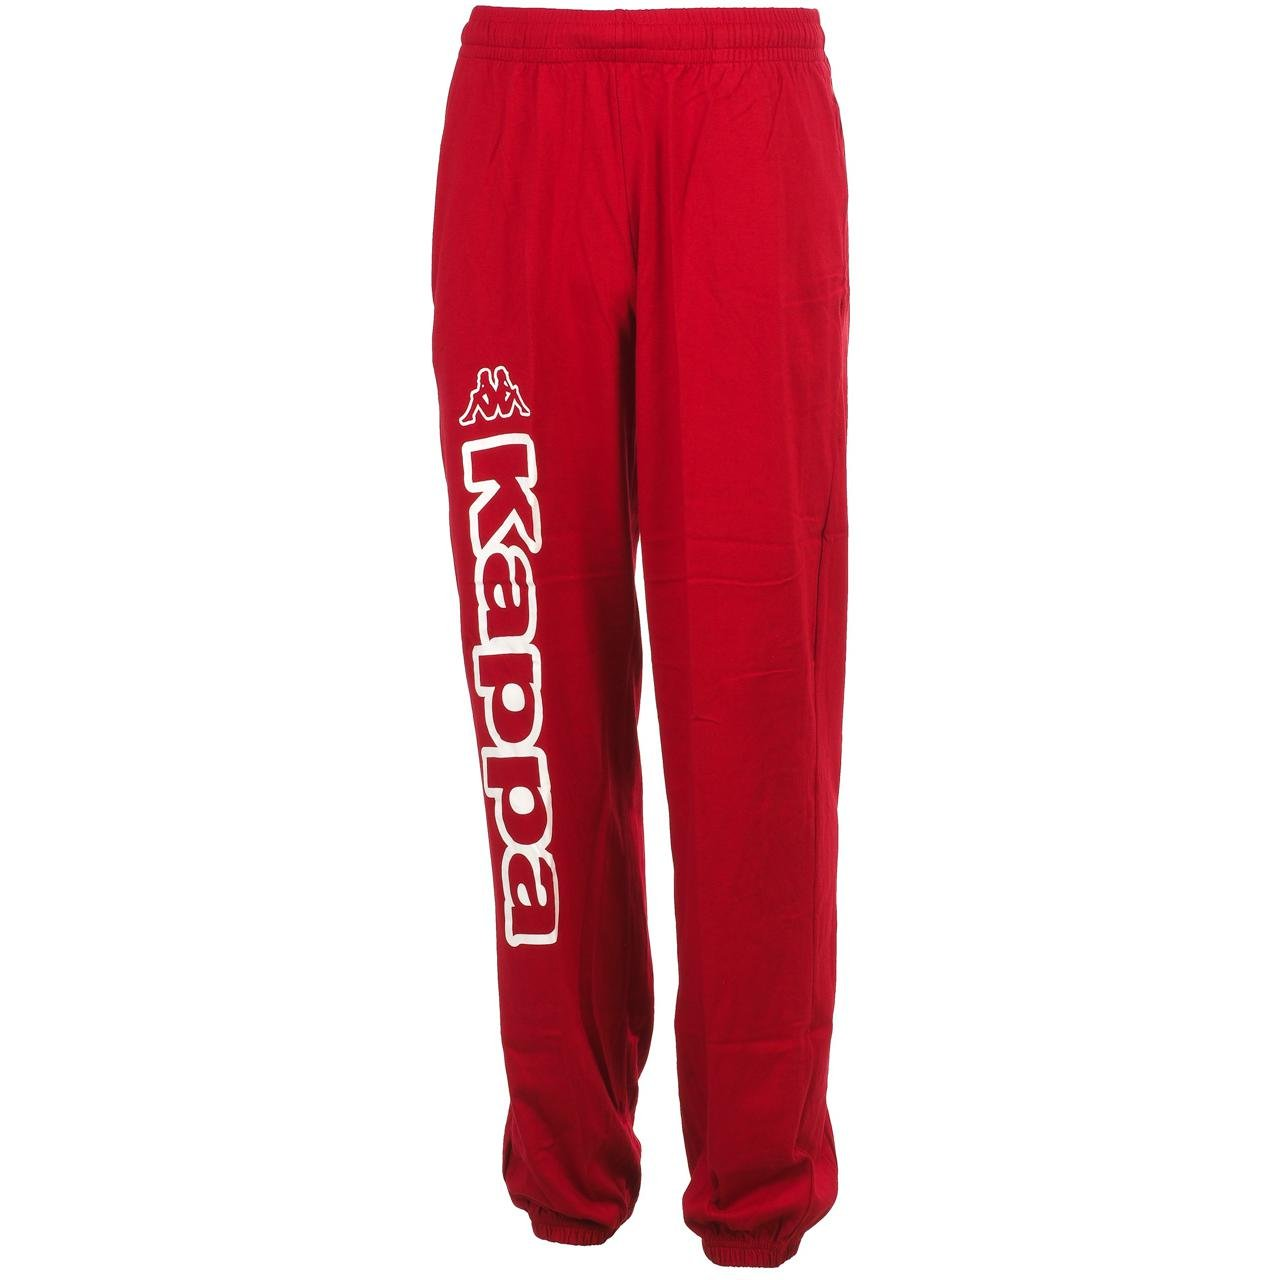 Kappa - costo rojo Pant survet - Pantalón de chándal, rojo, small ...